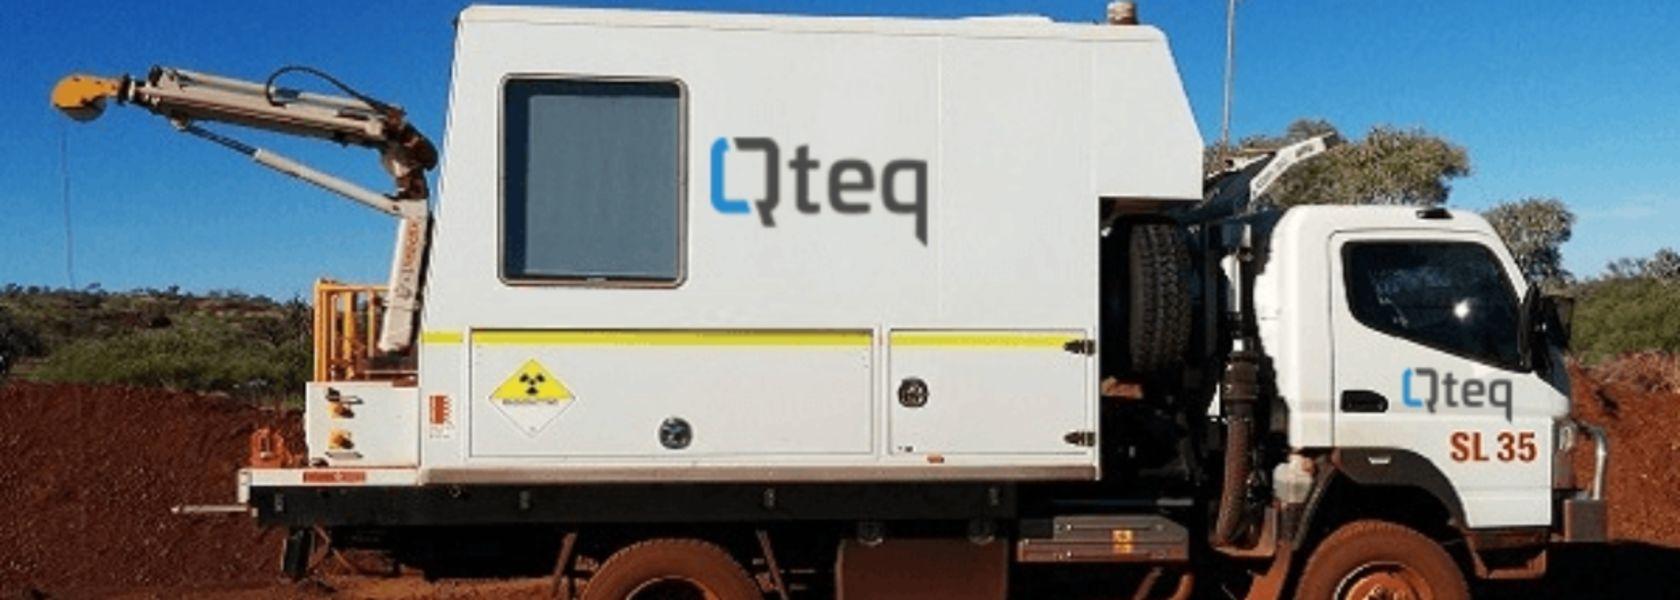 Qteq, Wireline Services to merge - Mining Magazine